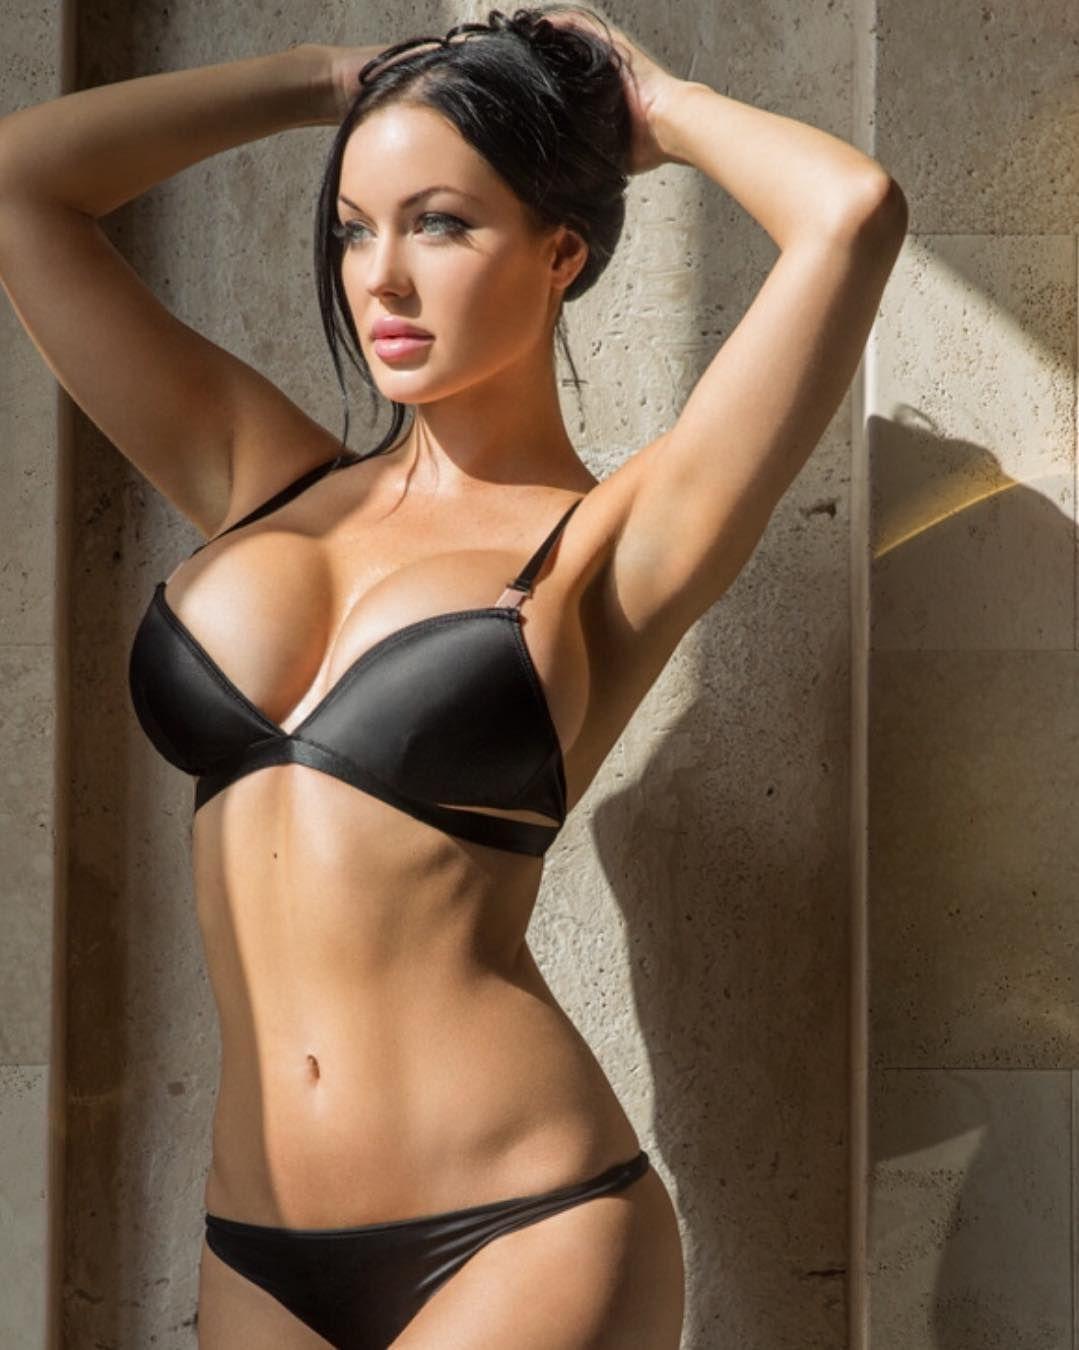 Bikini Veronica Valentine nudes (67 photo), Tits, Paparazzi, Feet, panties 2020